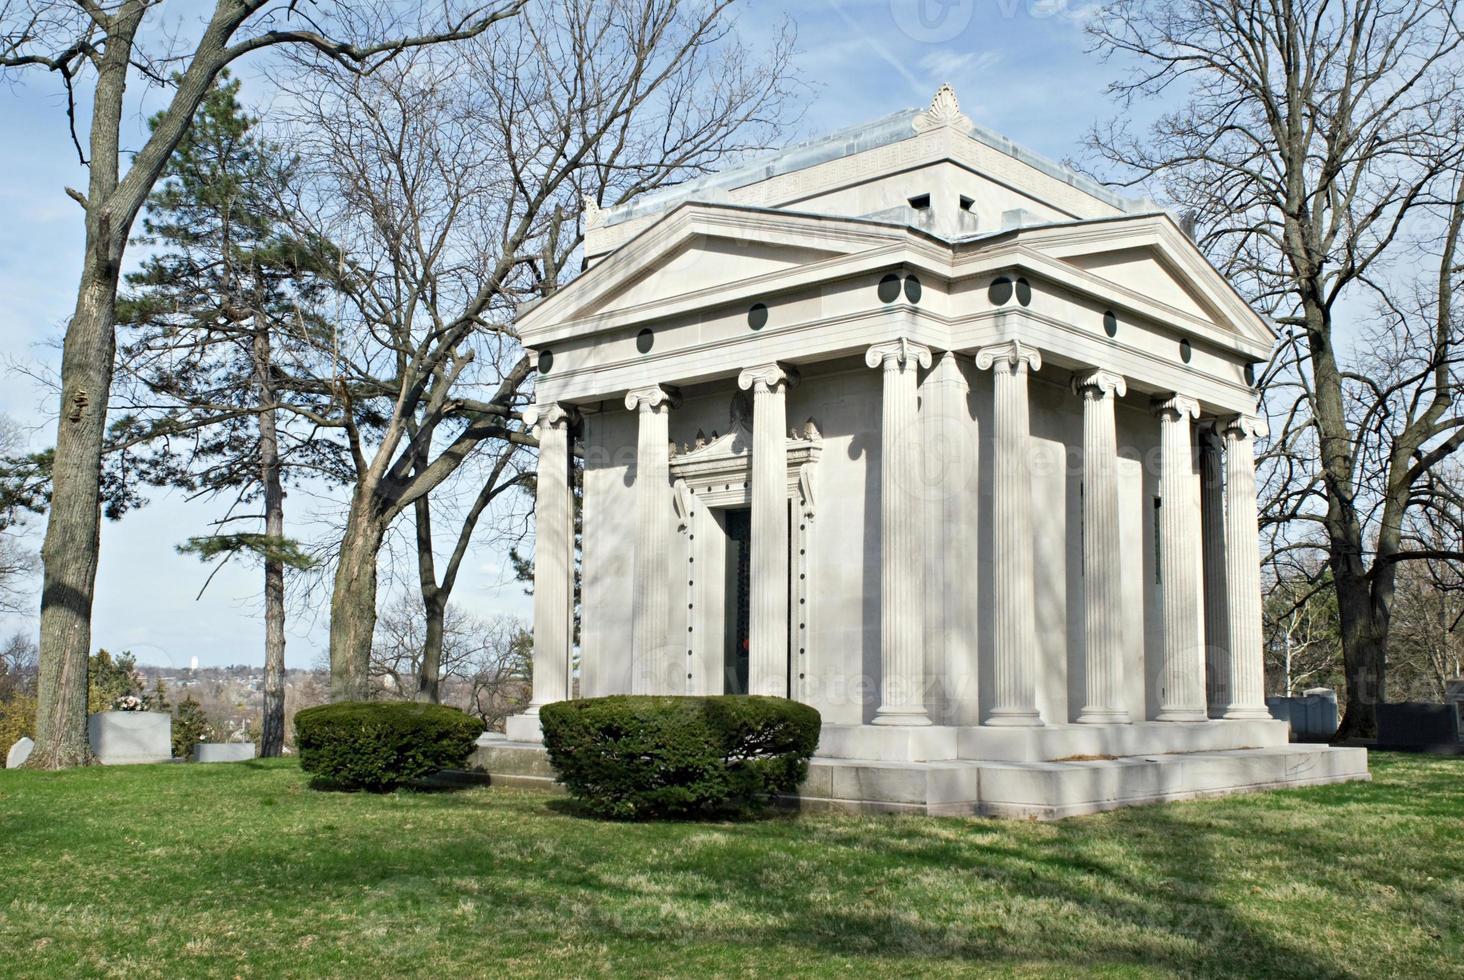 mausoleo di famiglia foto